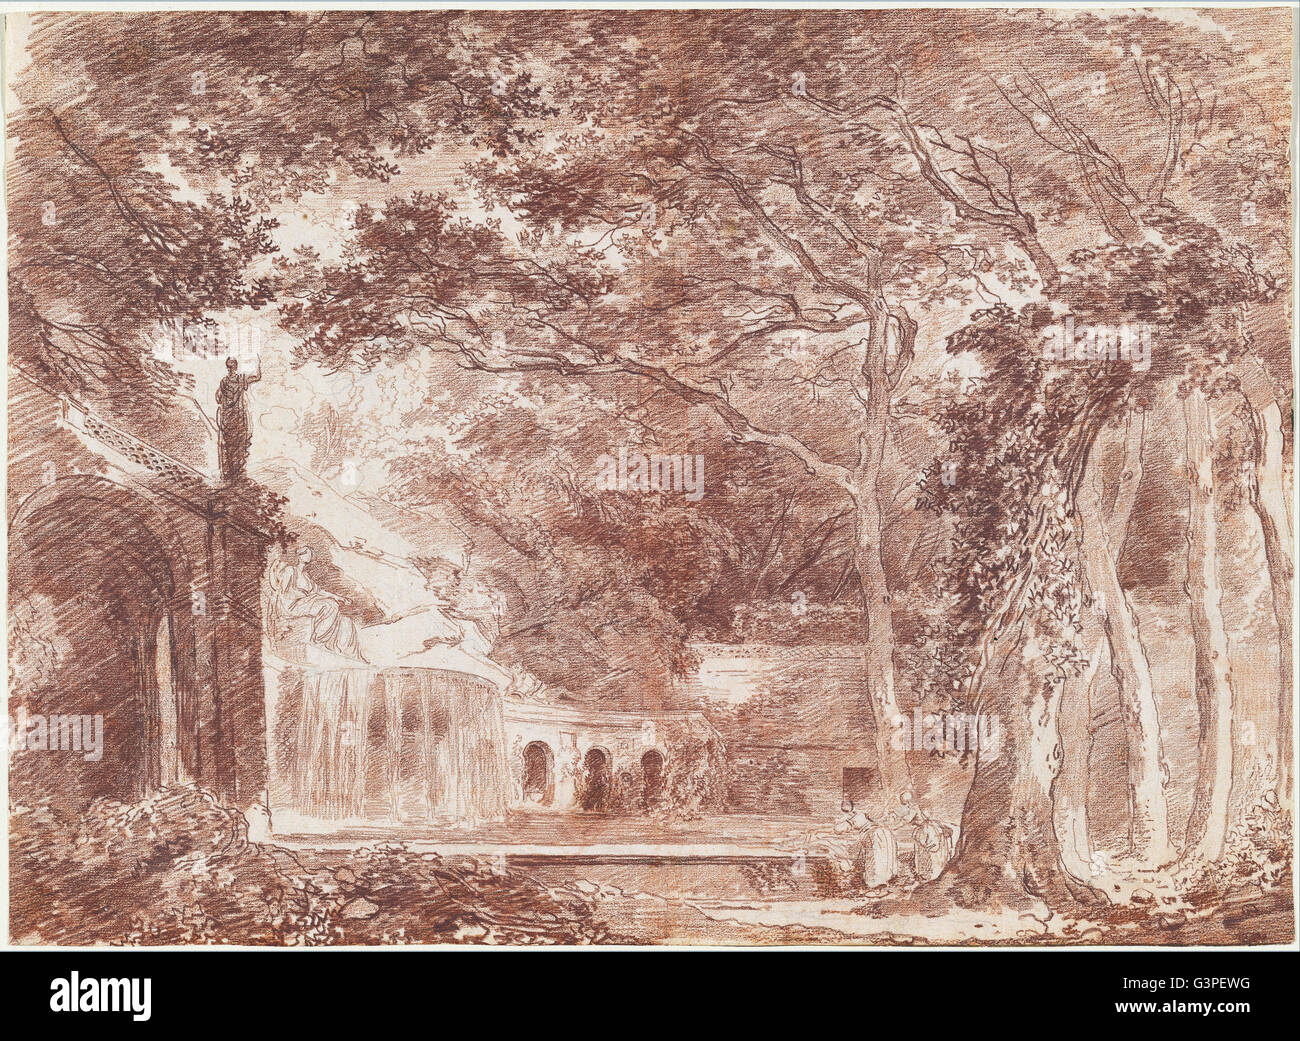 Hubert Robert - der ovalen Brunnen in den Gärten der Villa d ' Este, Tivoli - National Gallery of Art, Stockbild